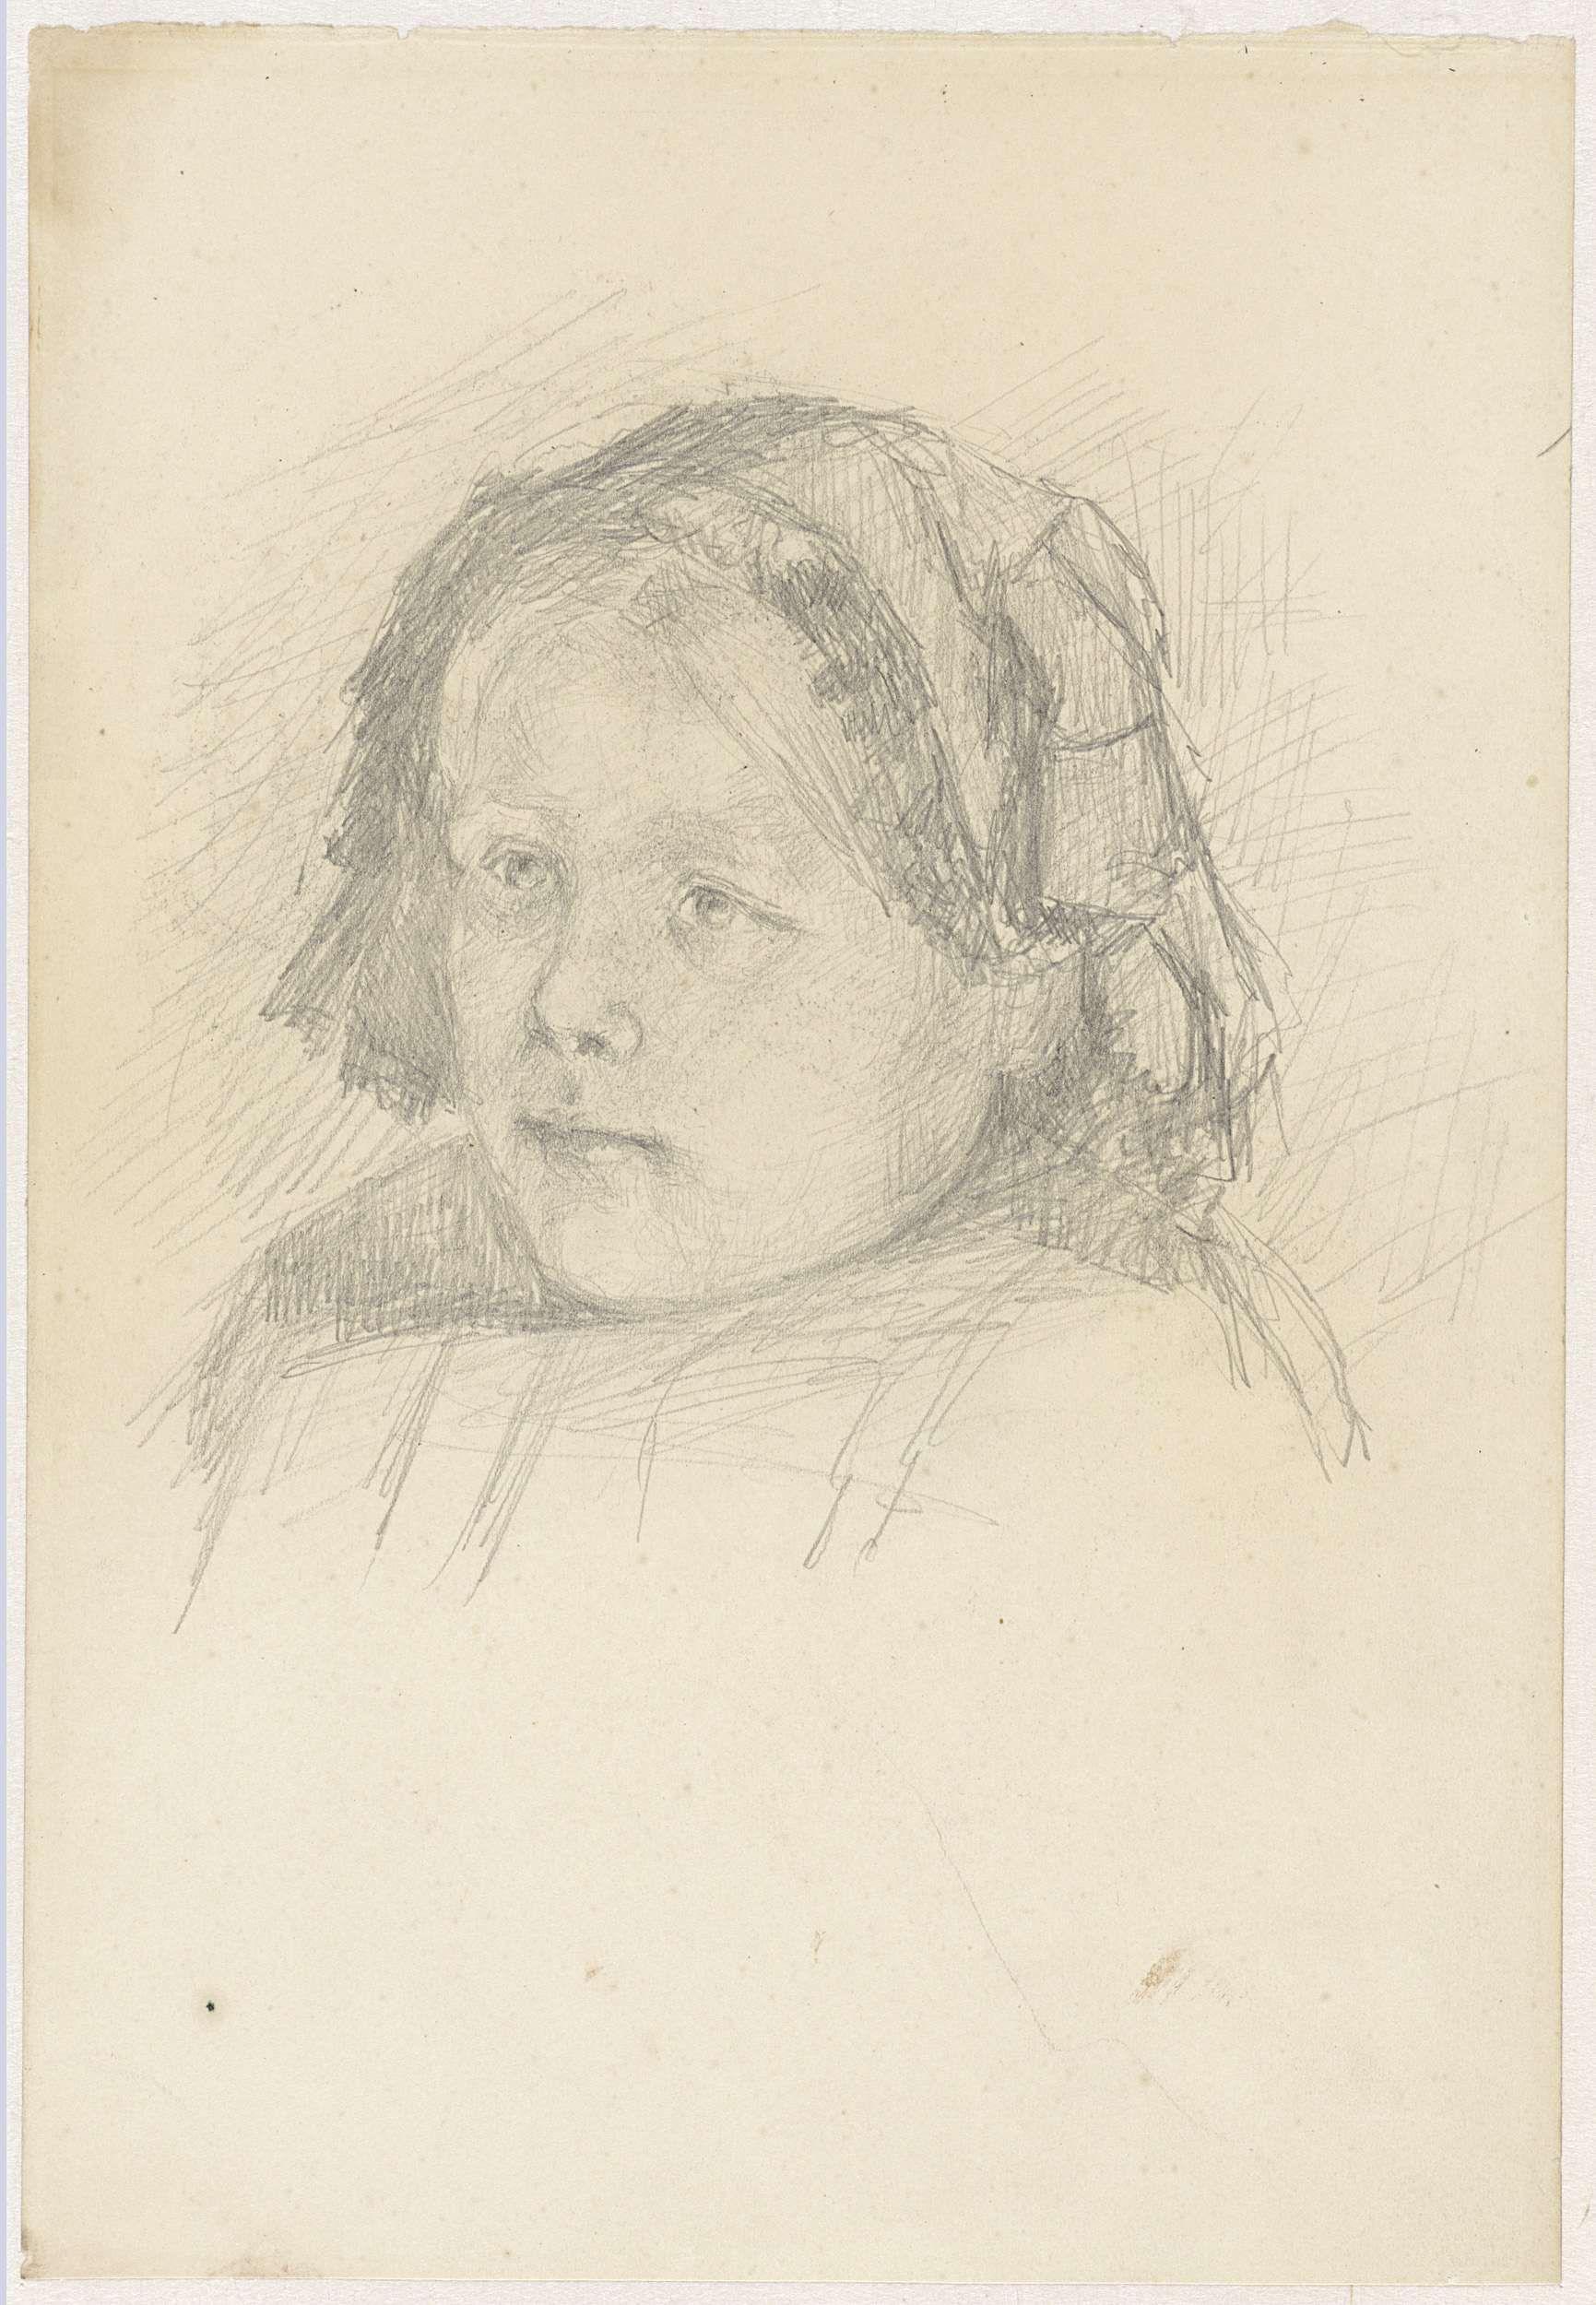 Jozef Israëls | Meisjeshoofd met kapje, Jozef Israëls, 1834 - 1911 |